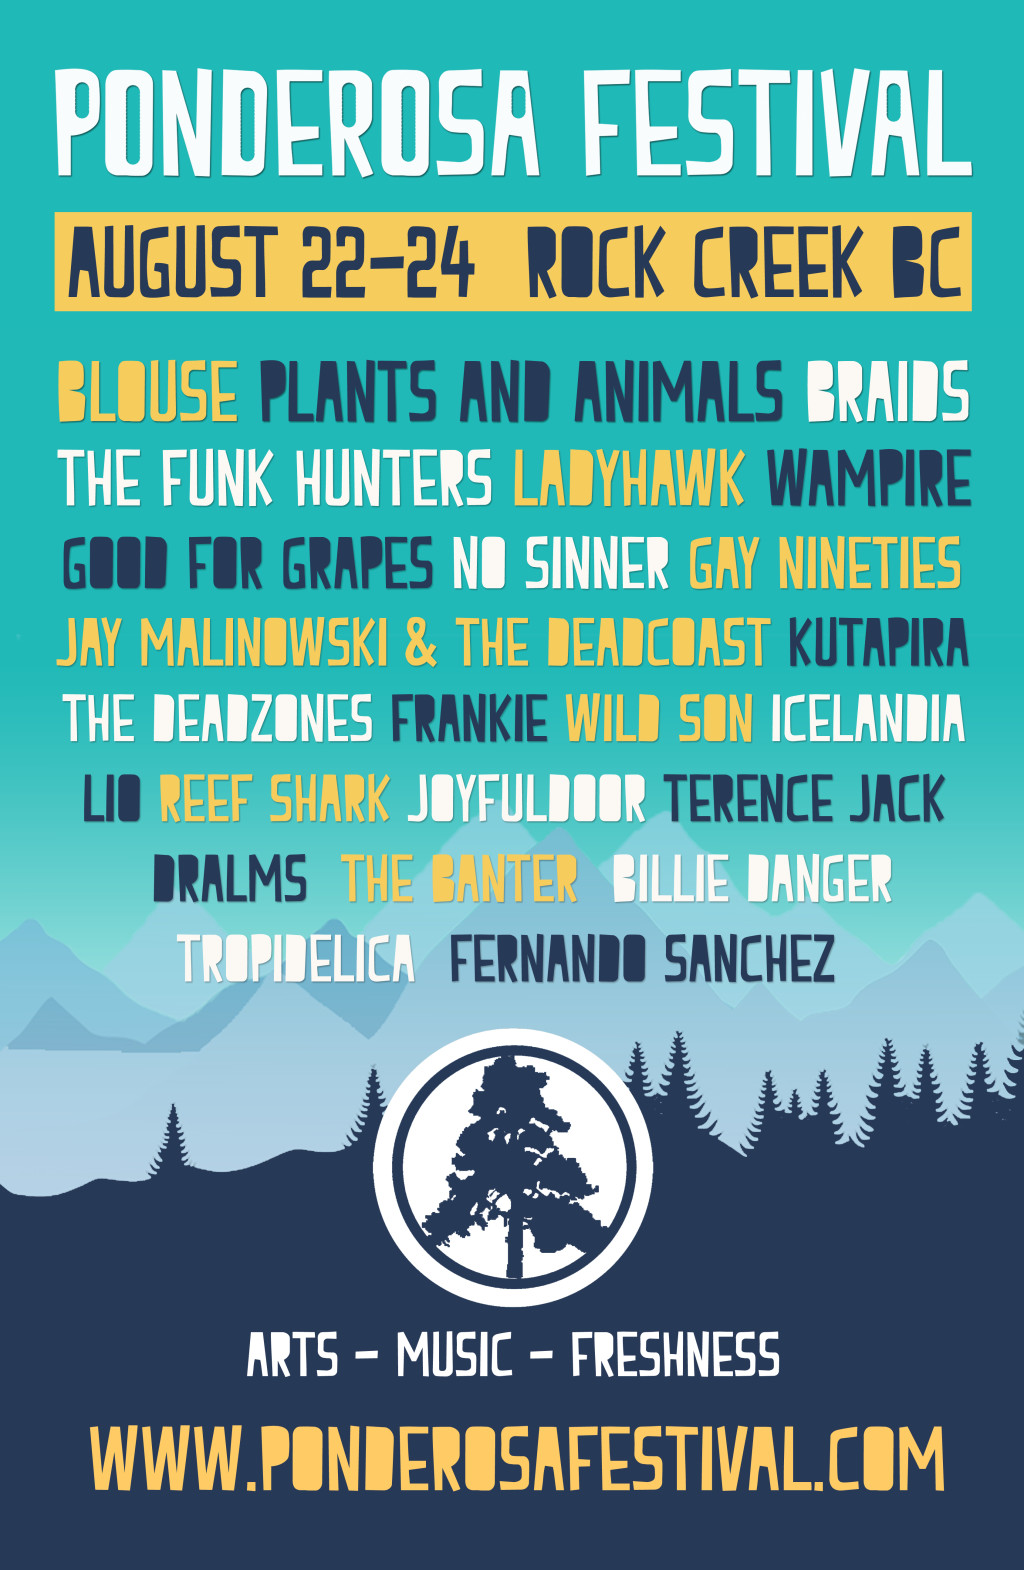 Ponderosa Festival Lineup